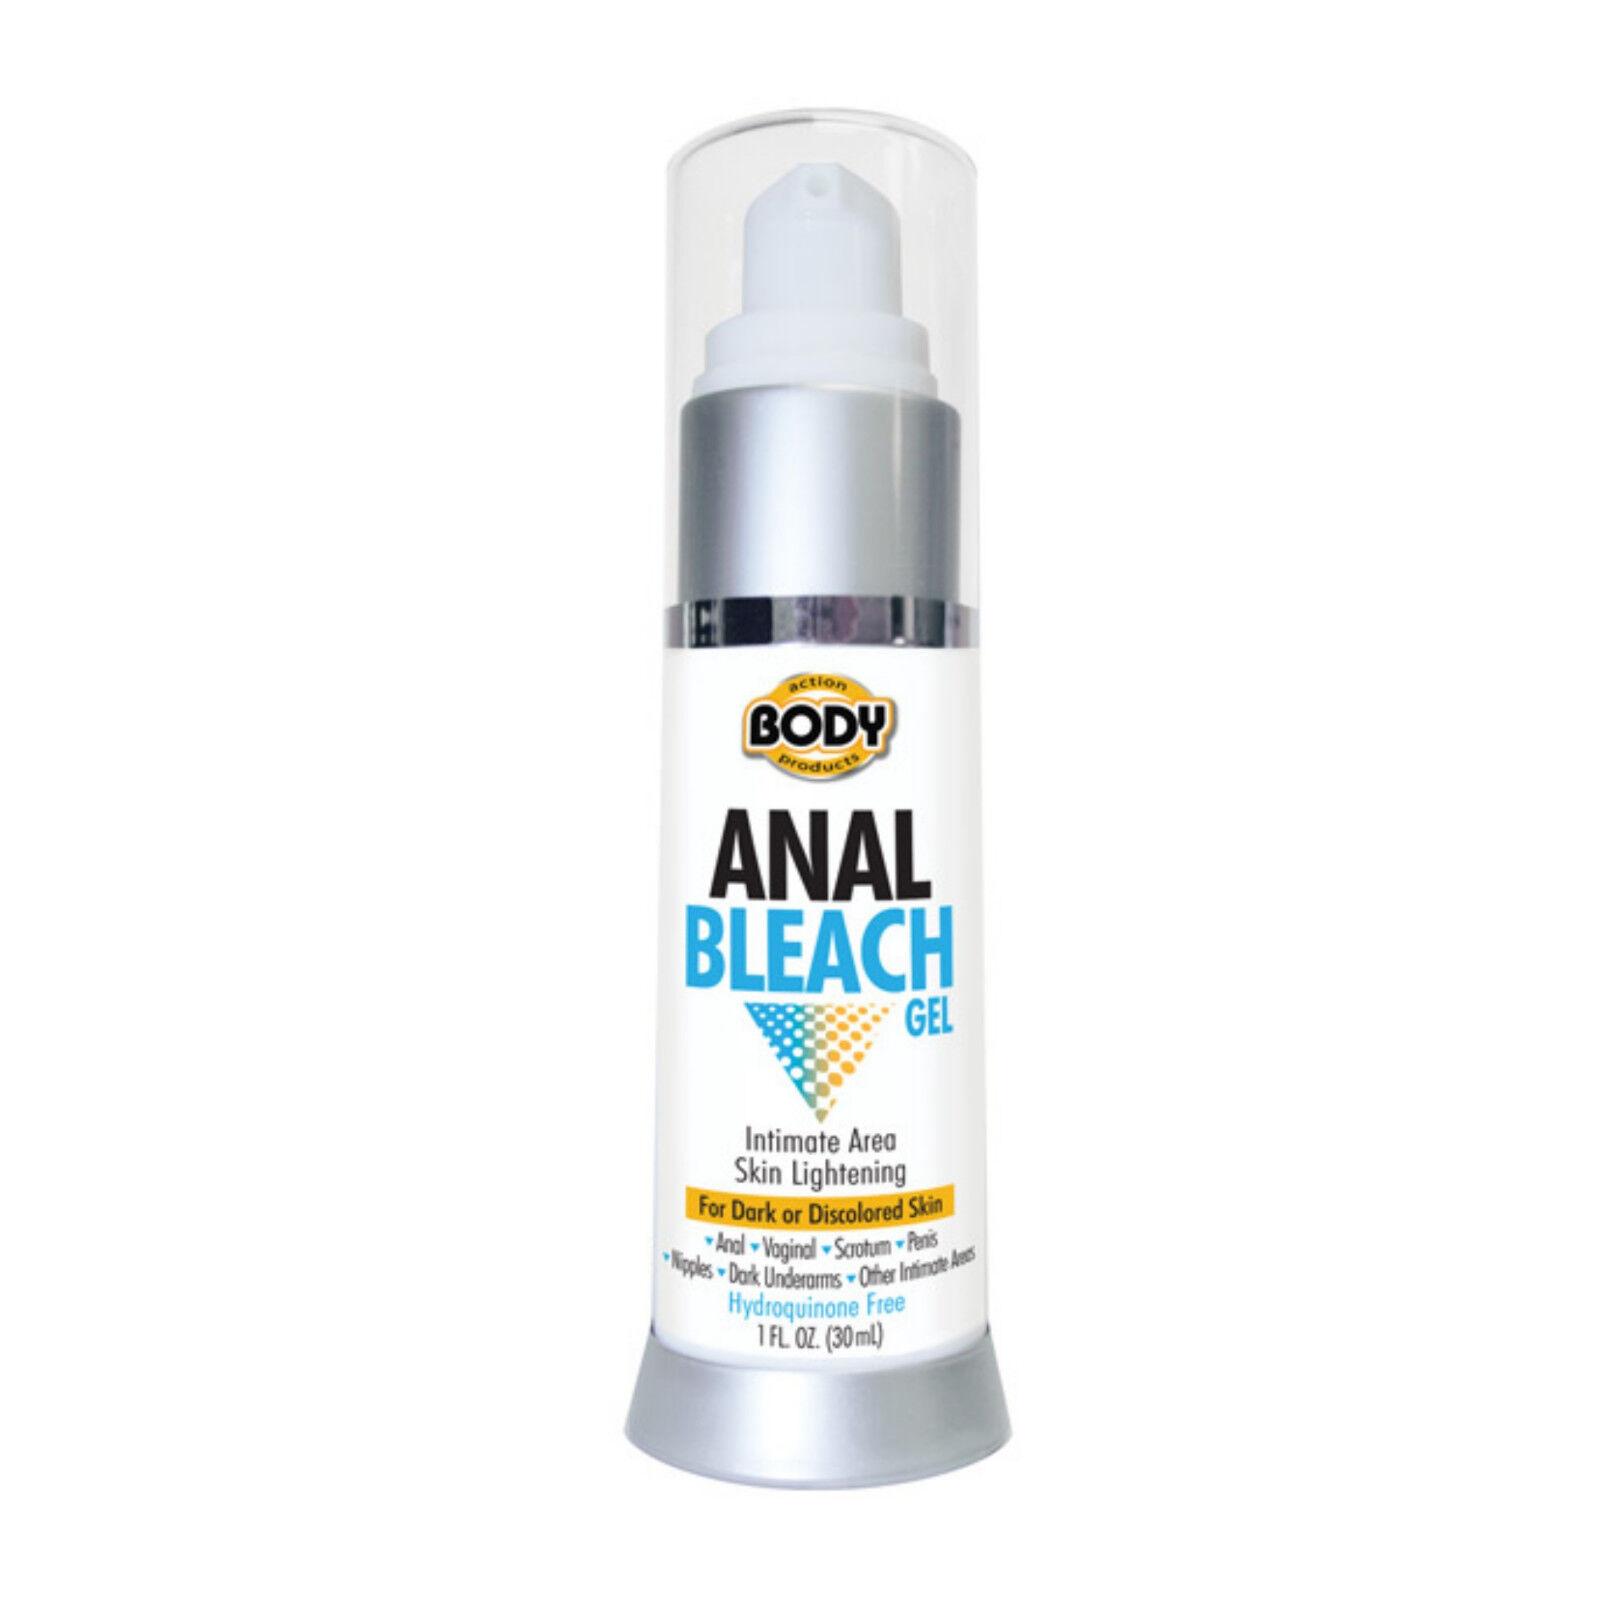 Anal bleach ingredients